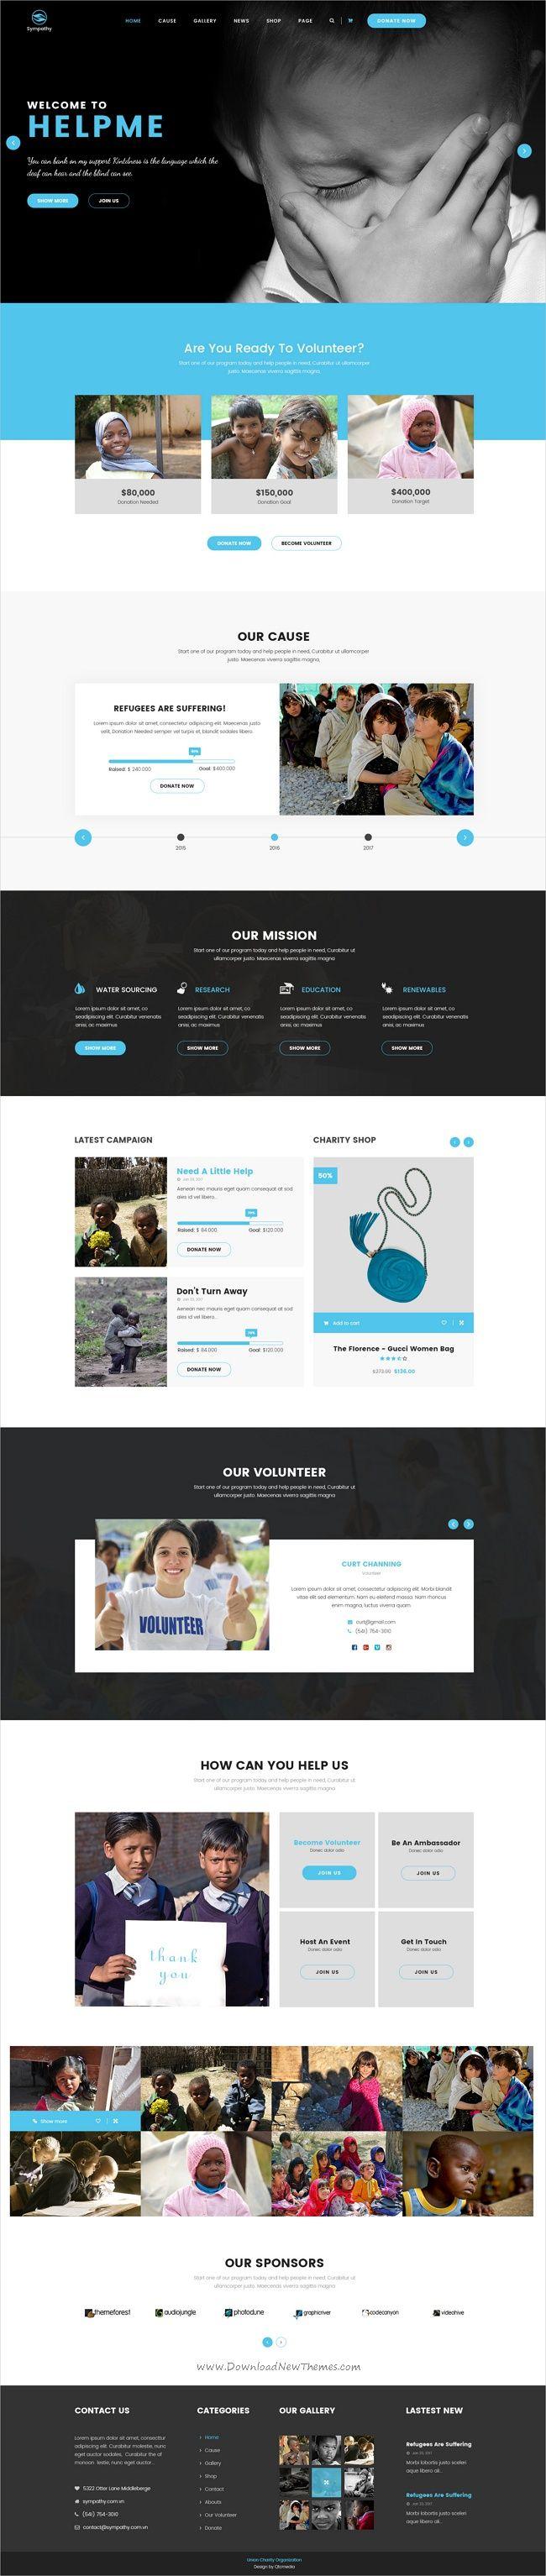 22 best Page contact images on Pinterest   Design web, Design ...